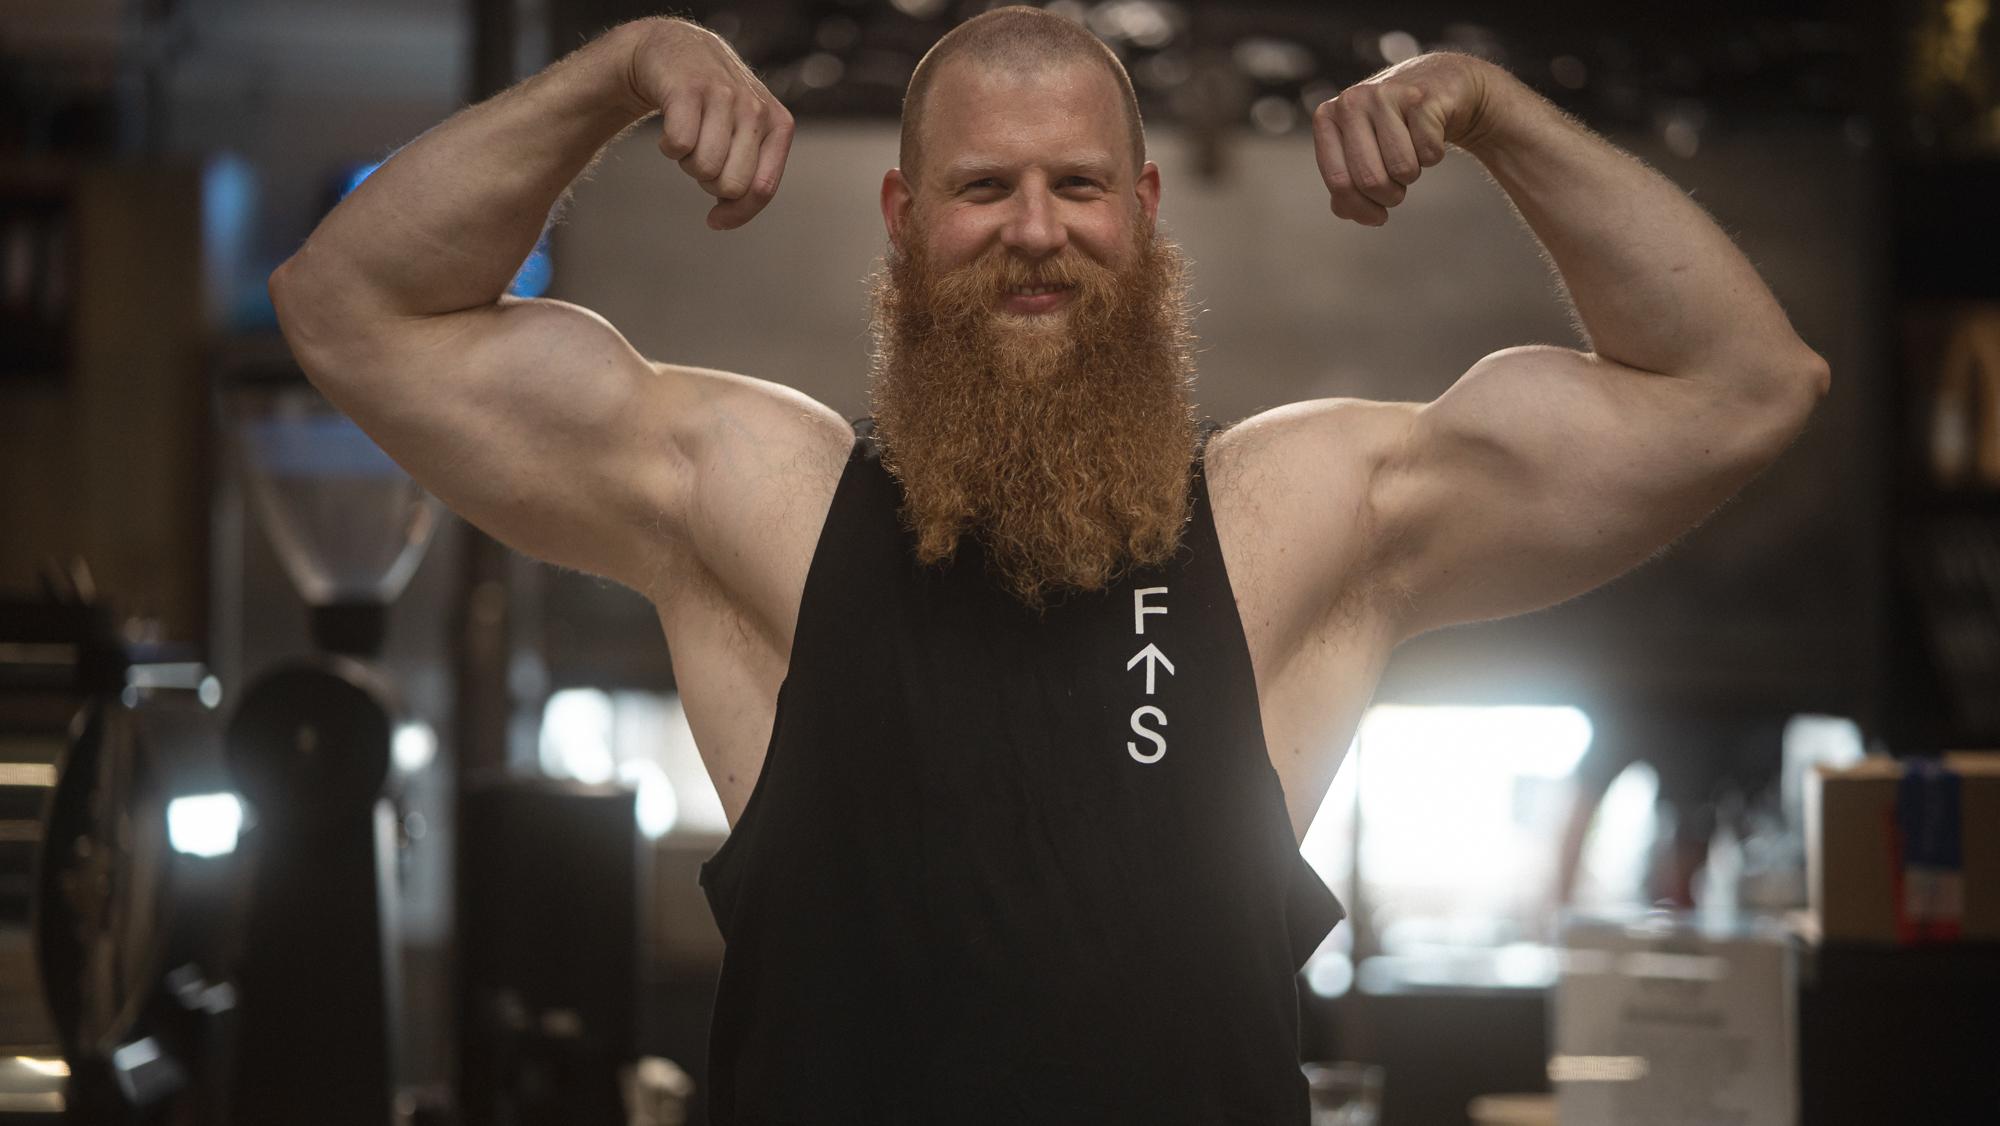 Faster Than Skincancer mit kraftdreikämpfer Alexander Pürzel 9